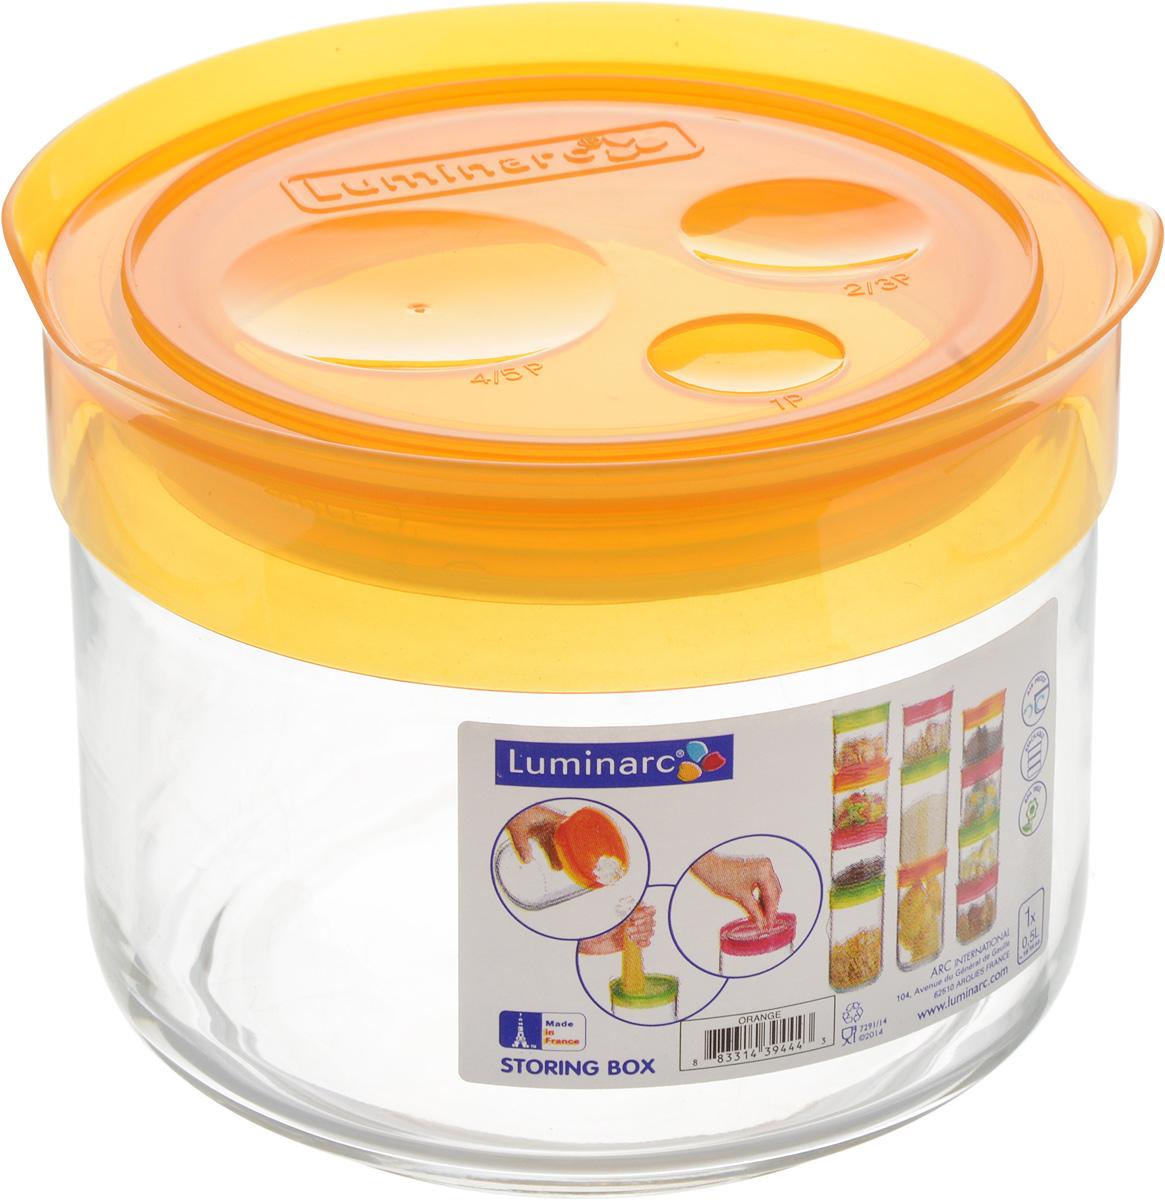 Банка для сыпучих продуктов Luminarc Storing Box, с крышкой, цвет: оранжевый, 500 мл банка 11х7 5х12 5 см 500 мл nouvelle банка 11х7 5х12 5 см 500 мл